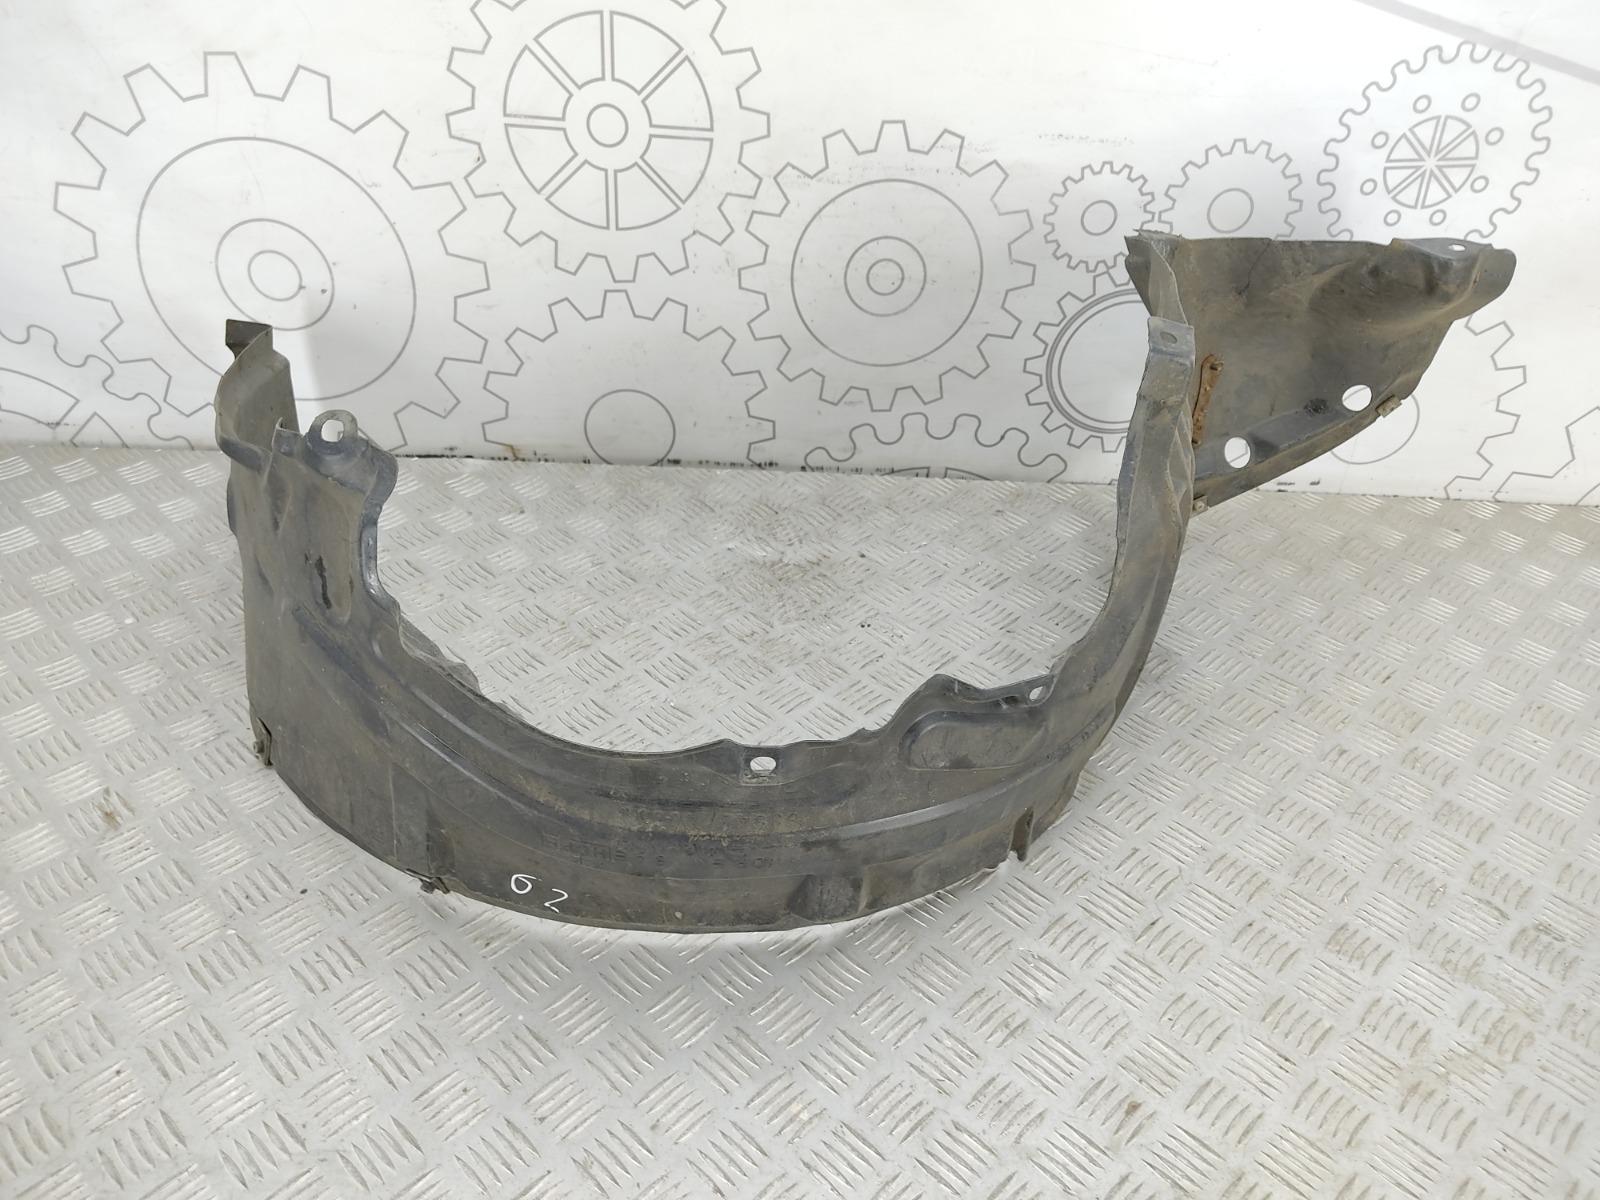 Защита арок передняя правая (подкрылок) Nissan Almera Tino 1.8 I 2005 (б/у)